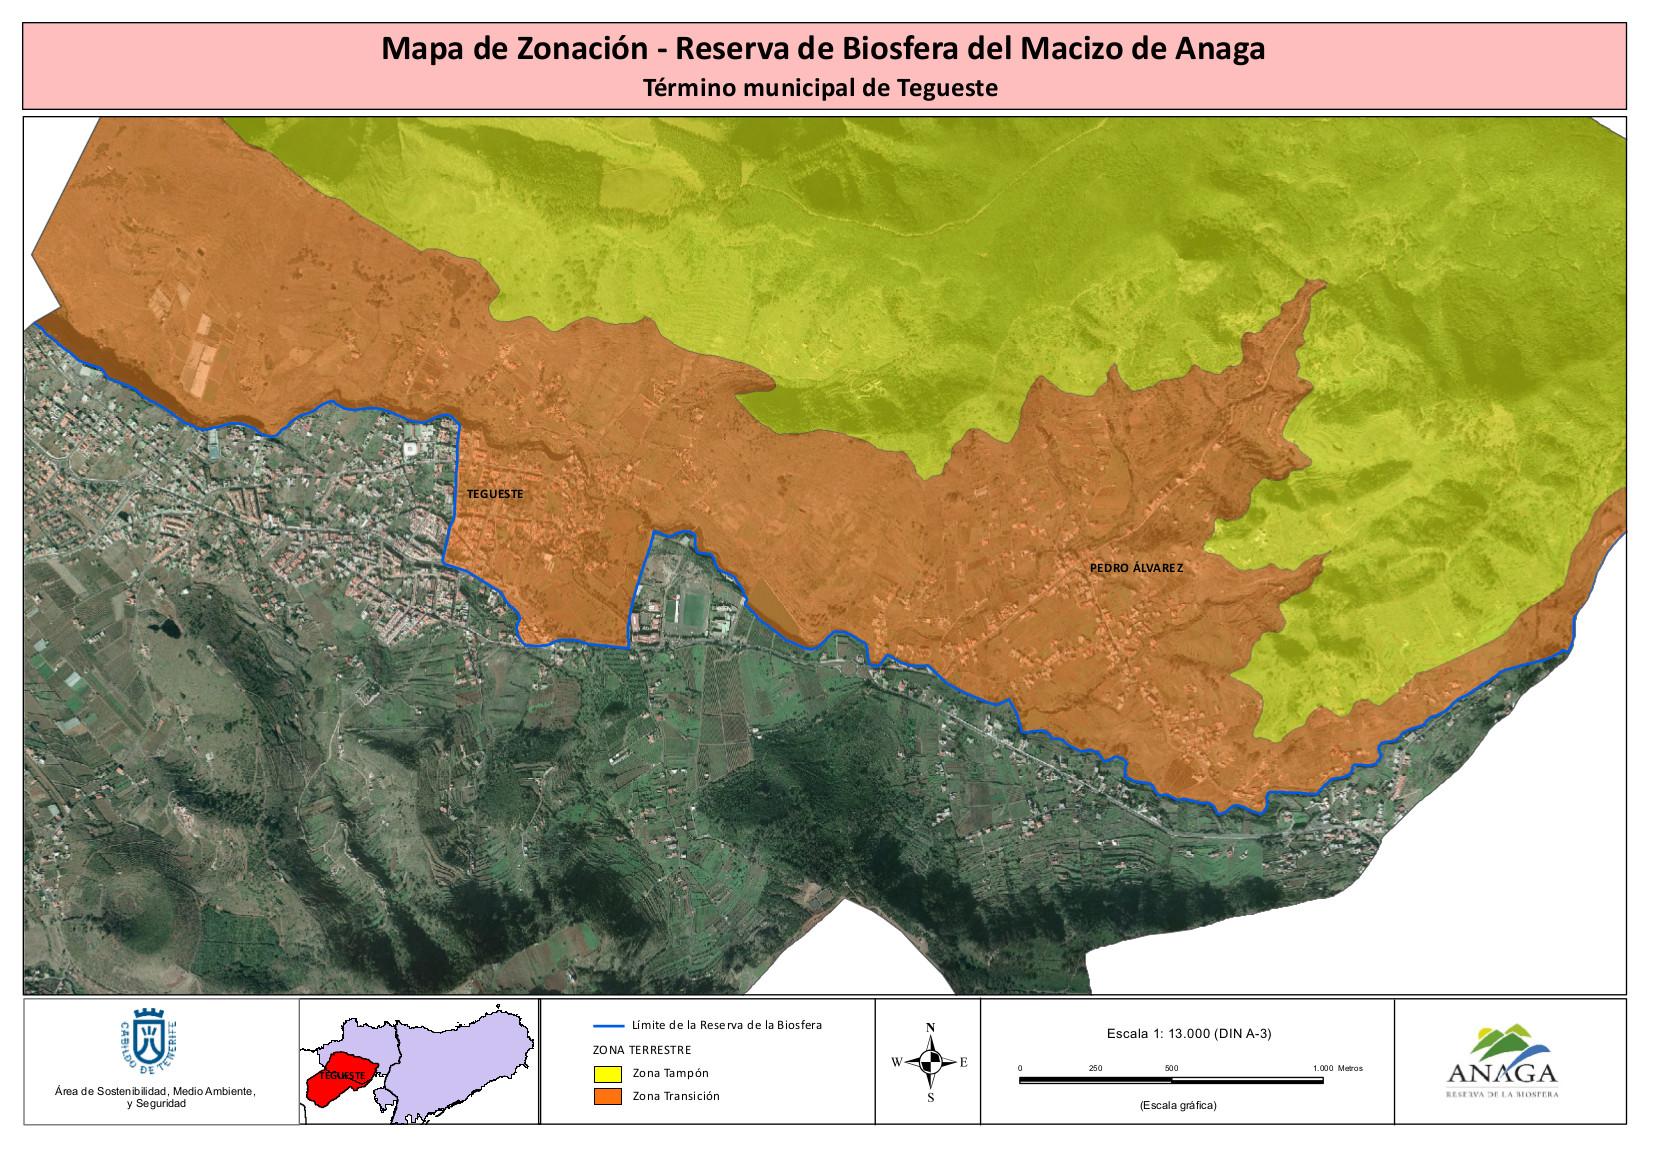 Mapa de Zonación Reserva de la Biofera del Macizo de Anaga - Término Municipal de Tegueste